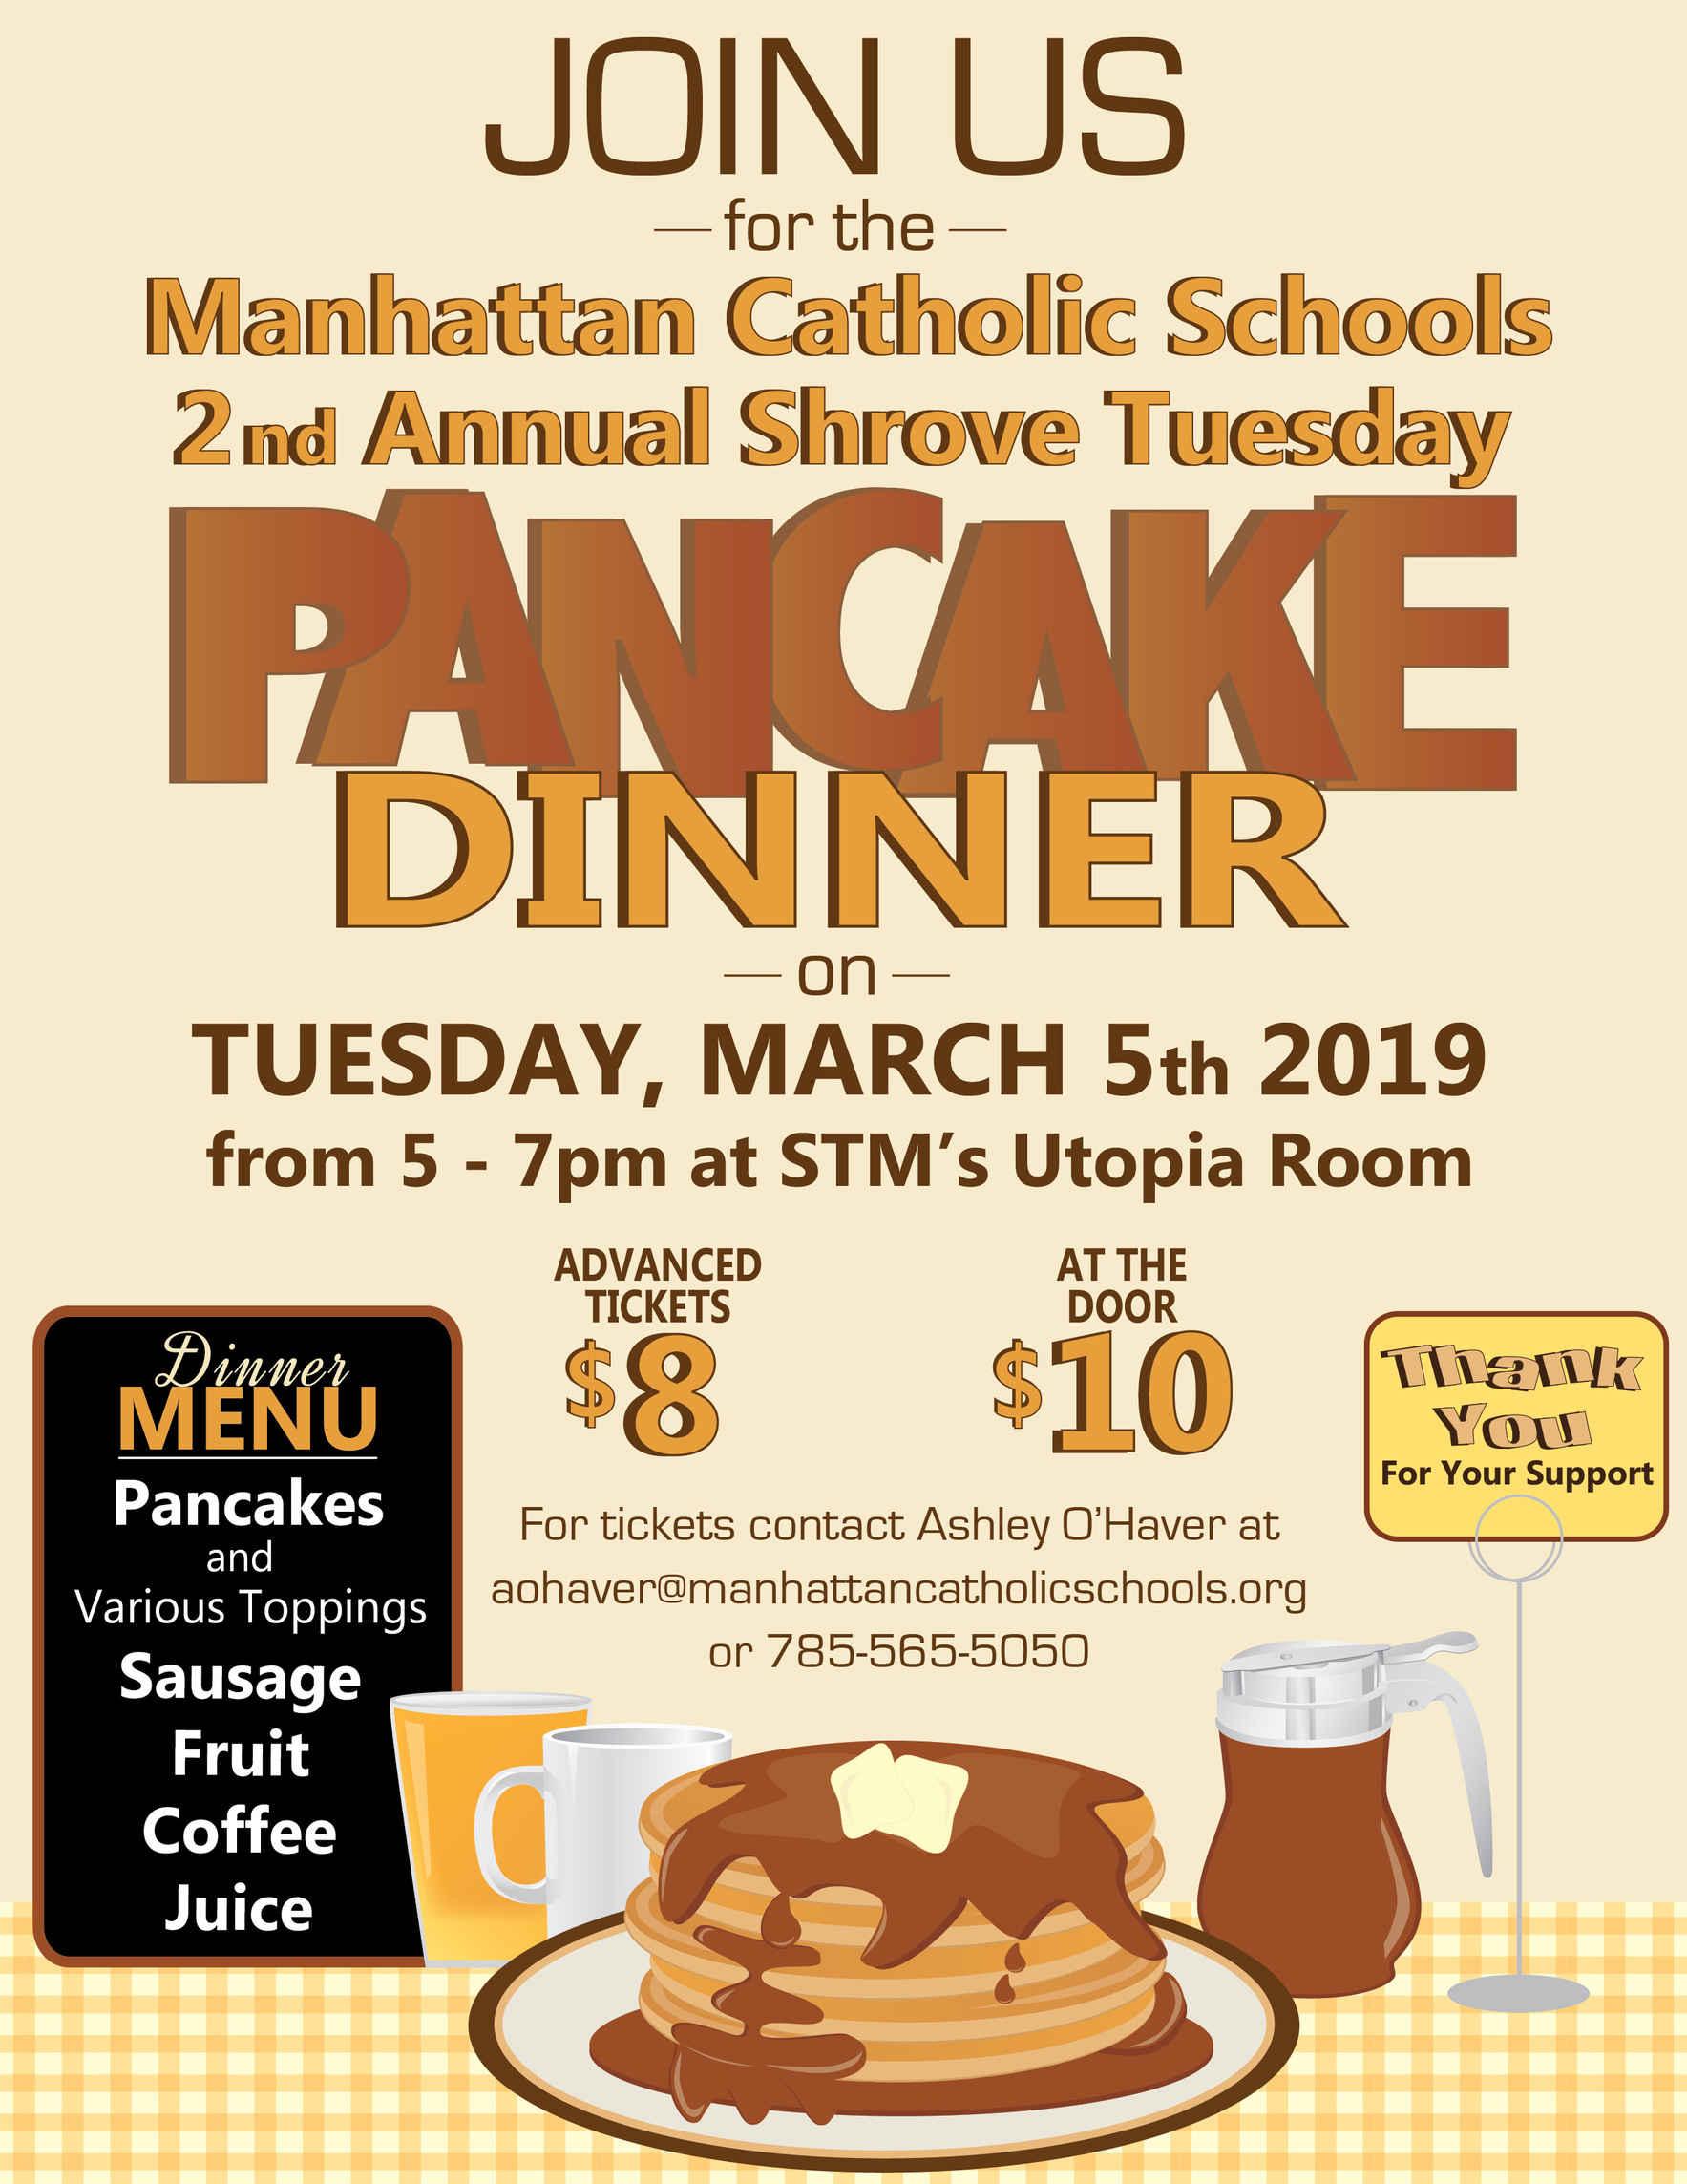 2nd Annual Shrove Tuesday Pancake Dinner image